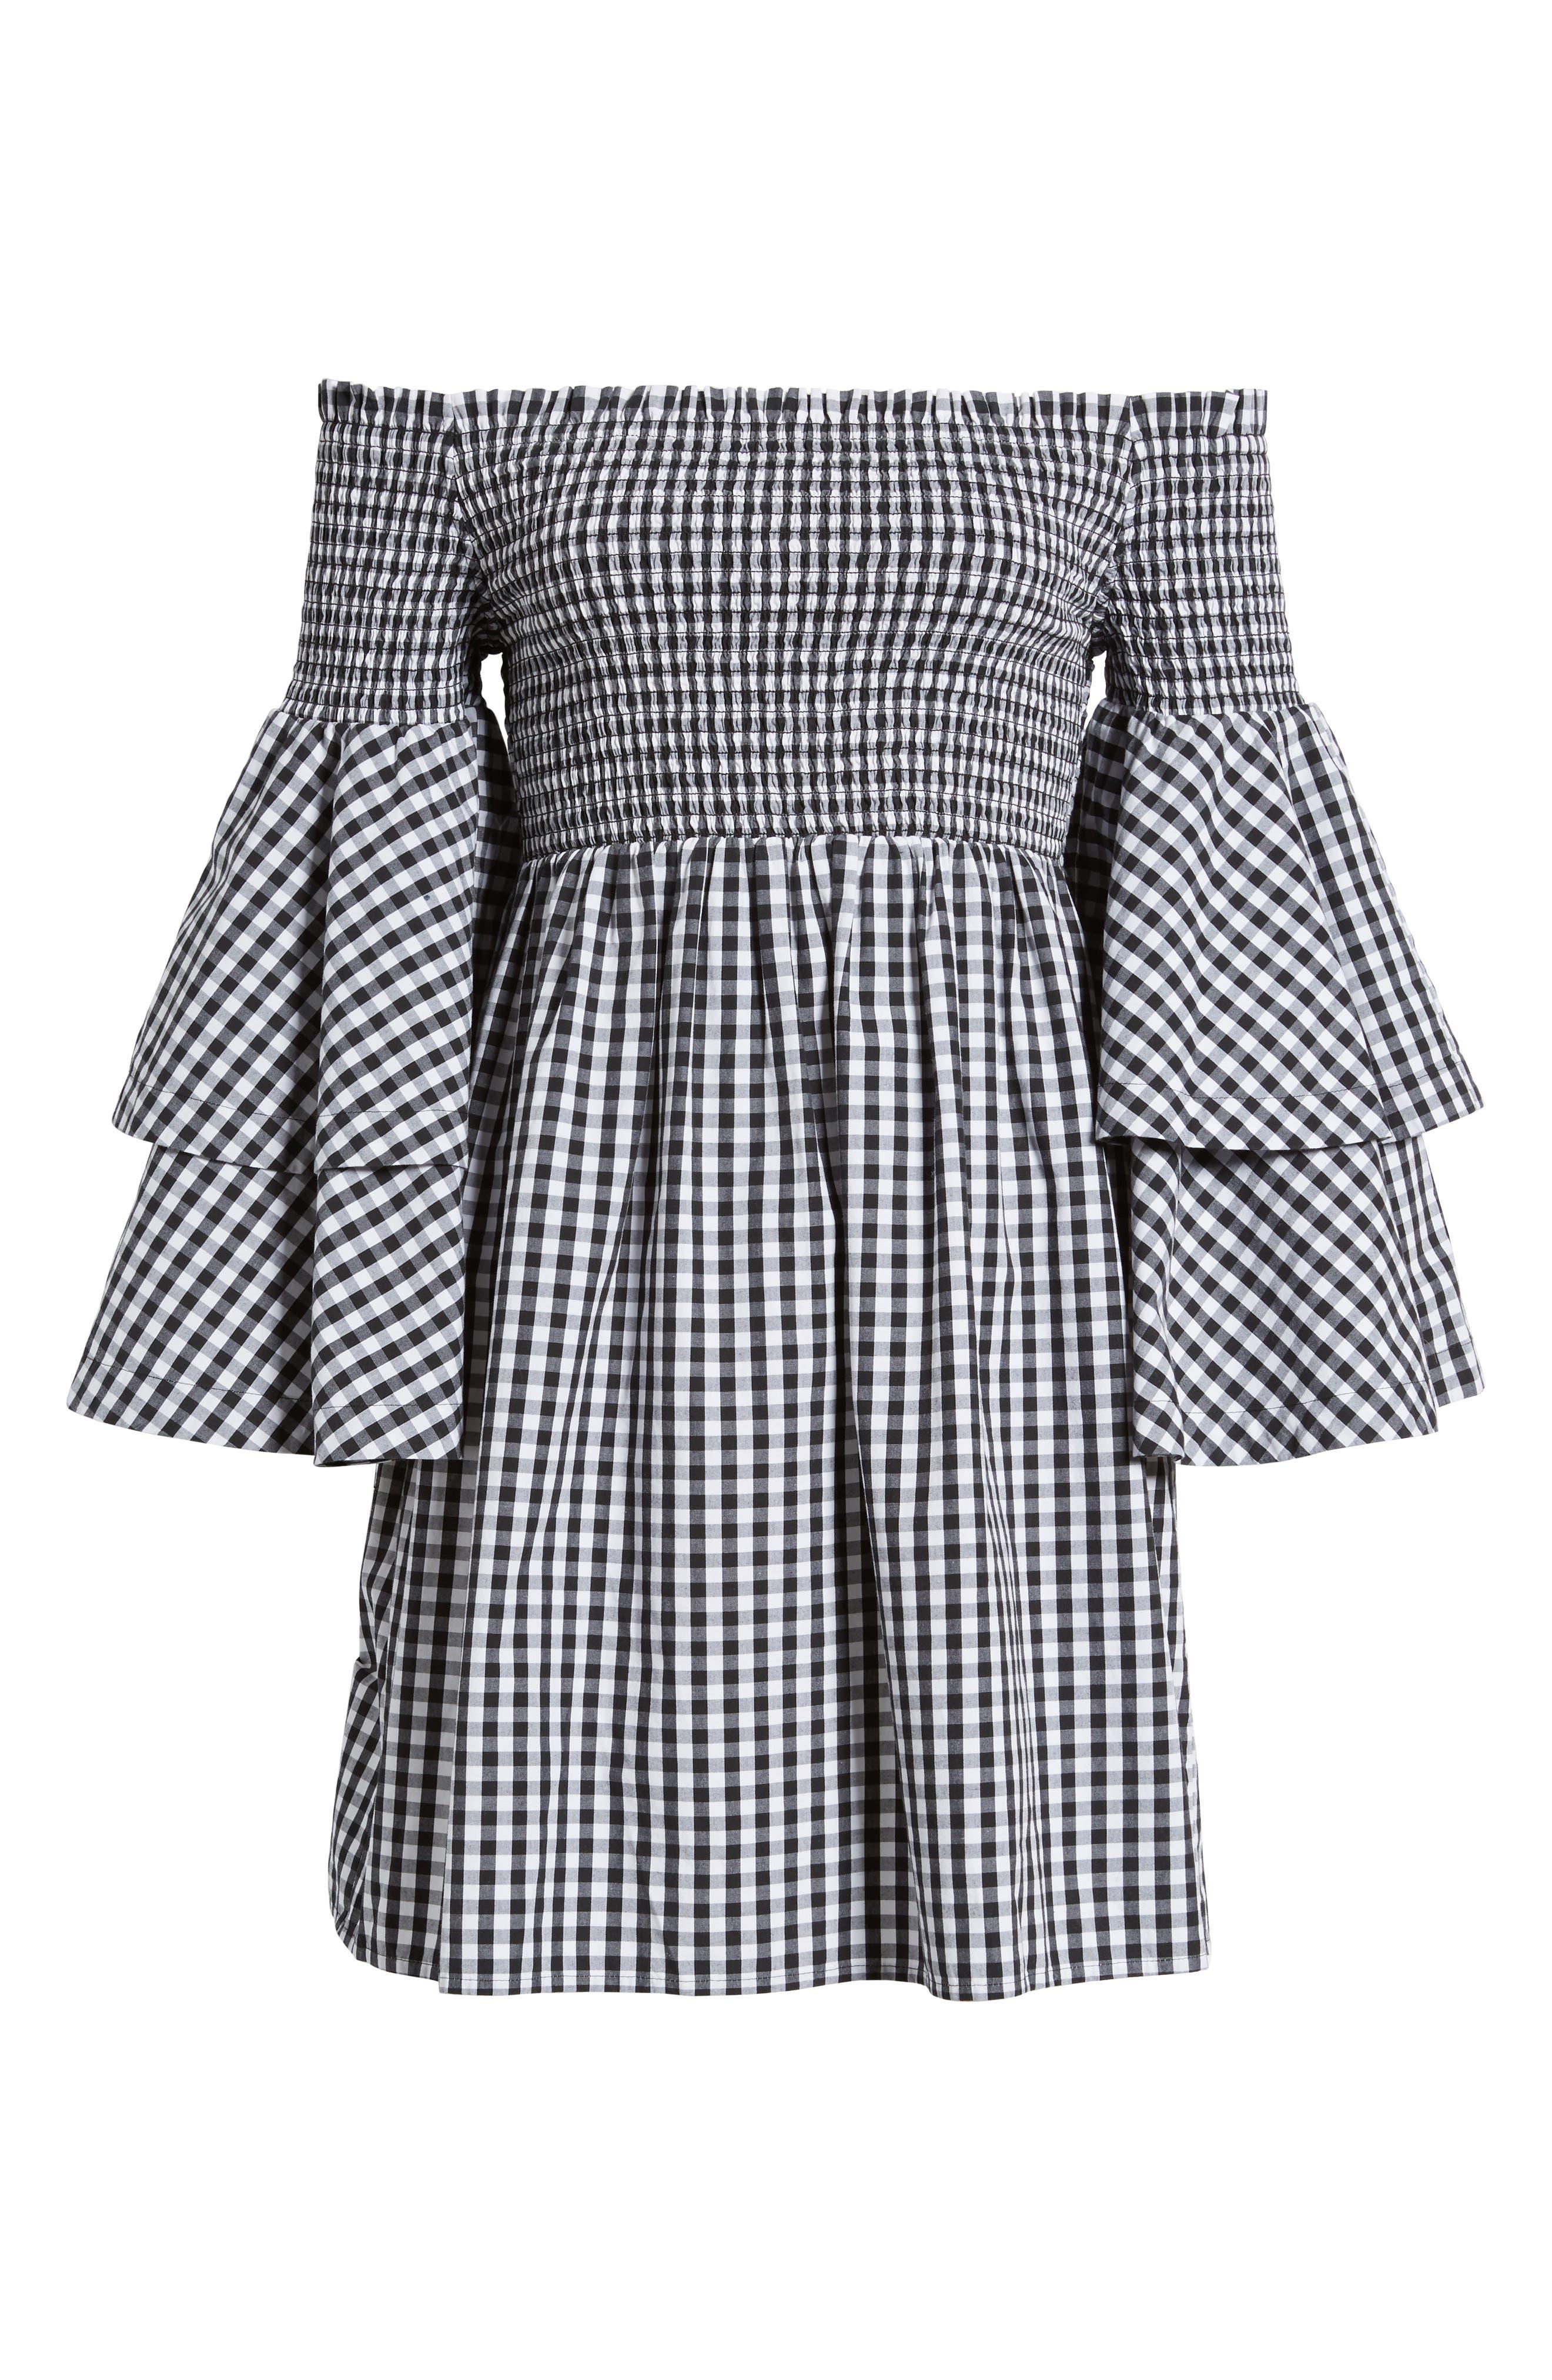 Smocked Off the Shoulder Bell Sleeve Dress,                             Alternate thumbnail 6, color,                             001